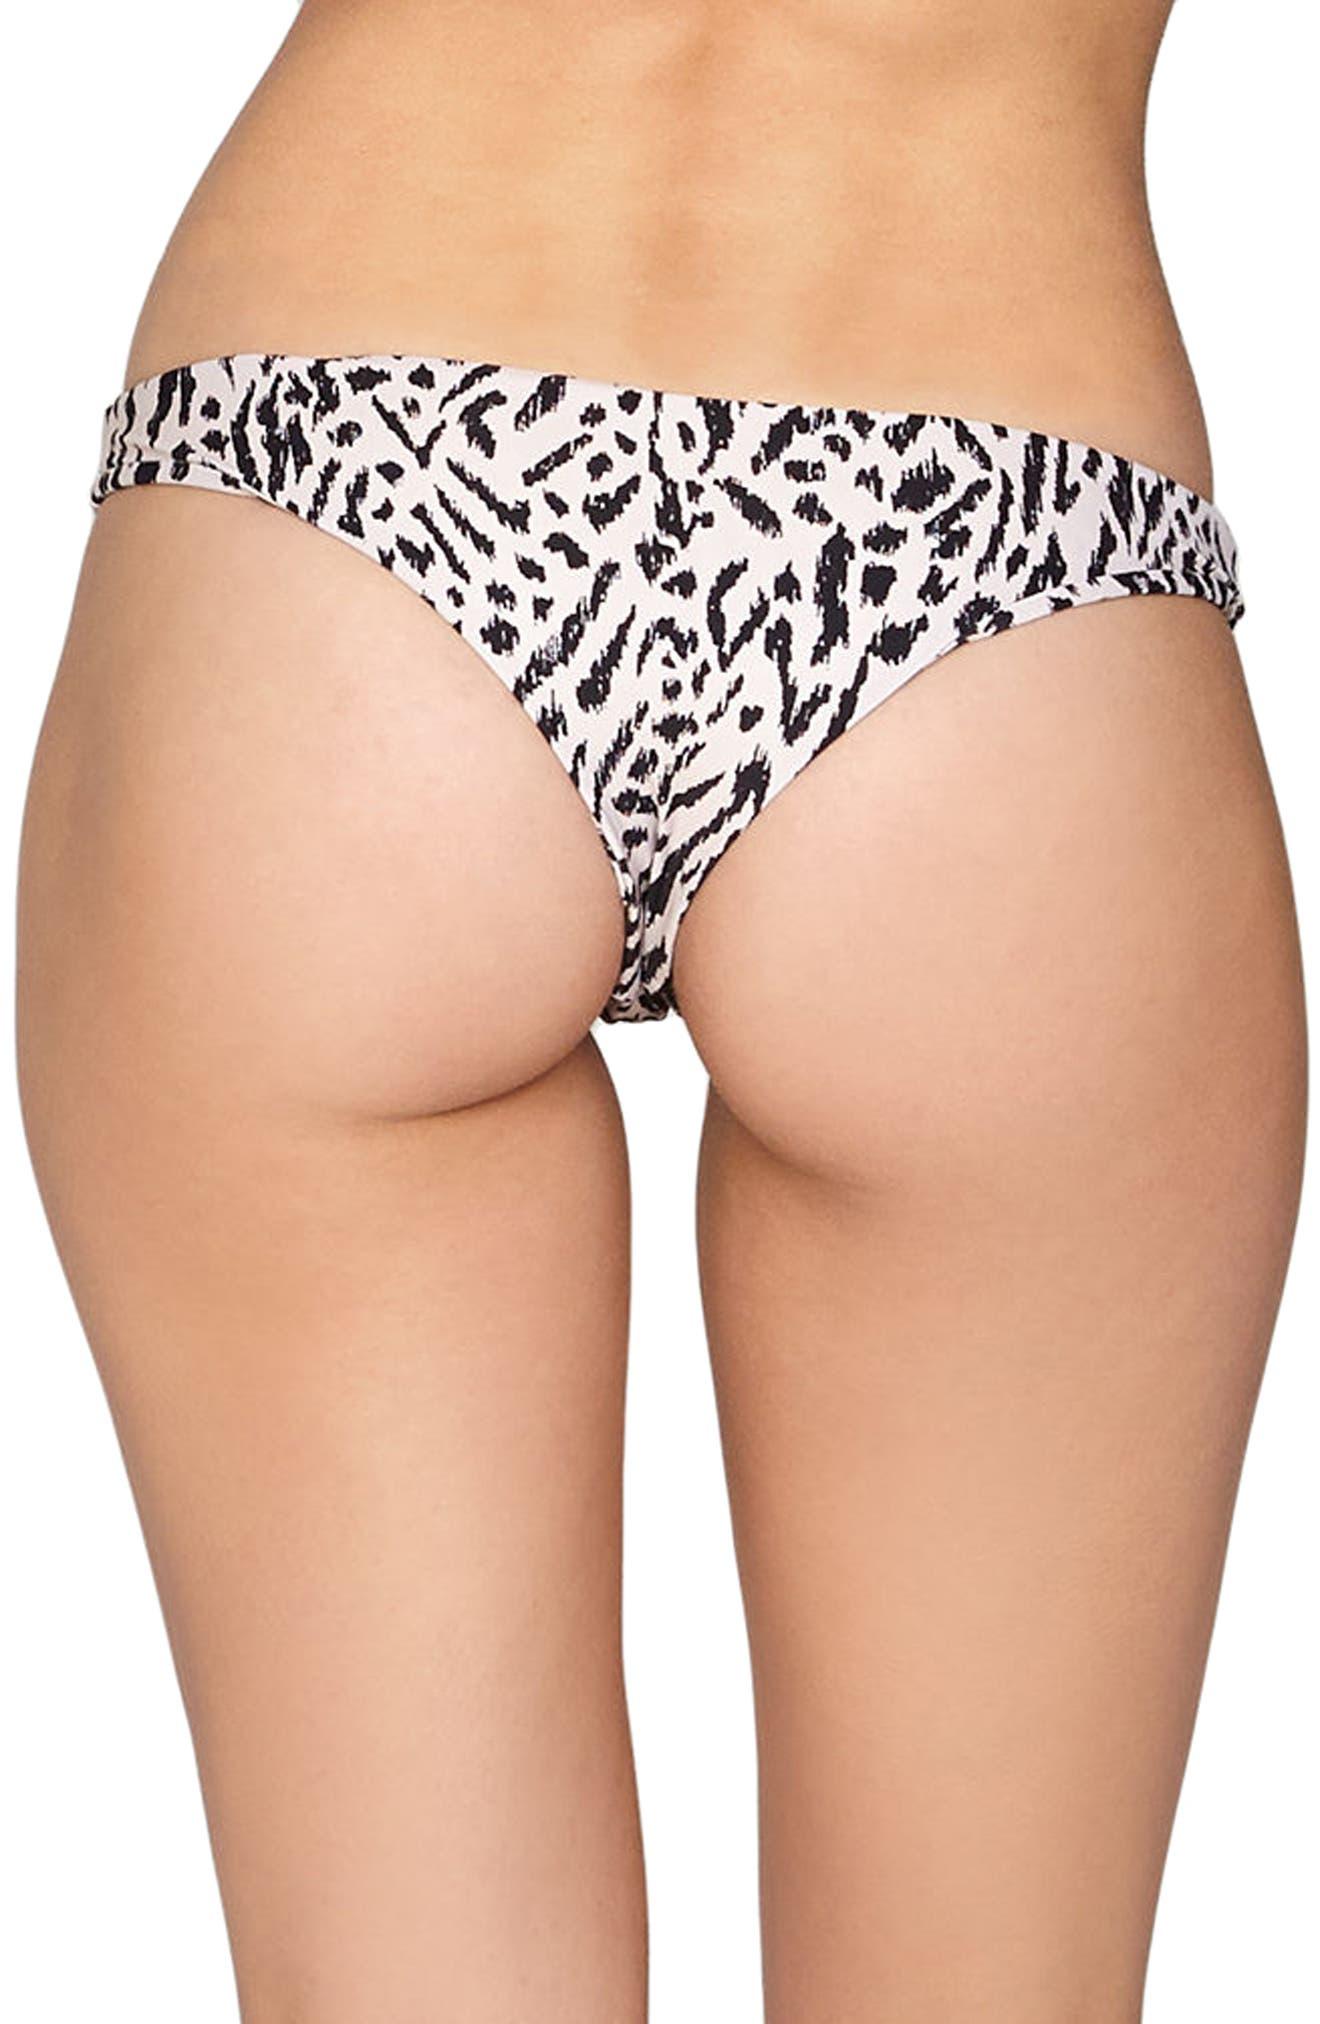 Jaine Teensy Bikini Bottoms,                             Alternate thumbnail 2, color,